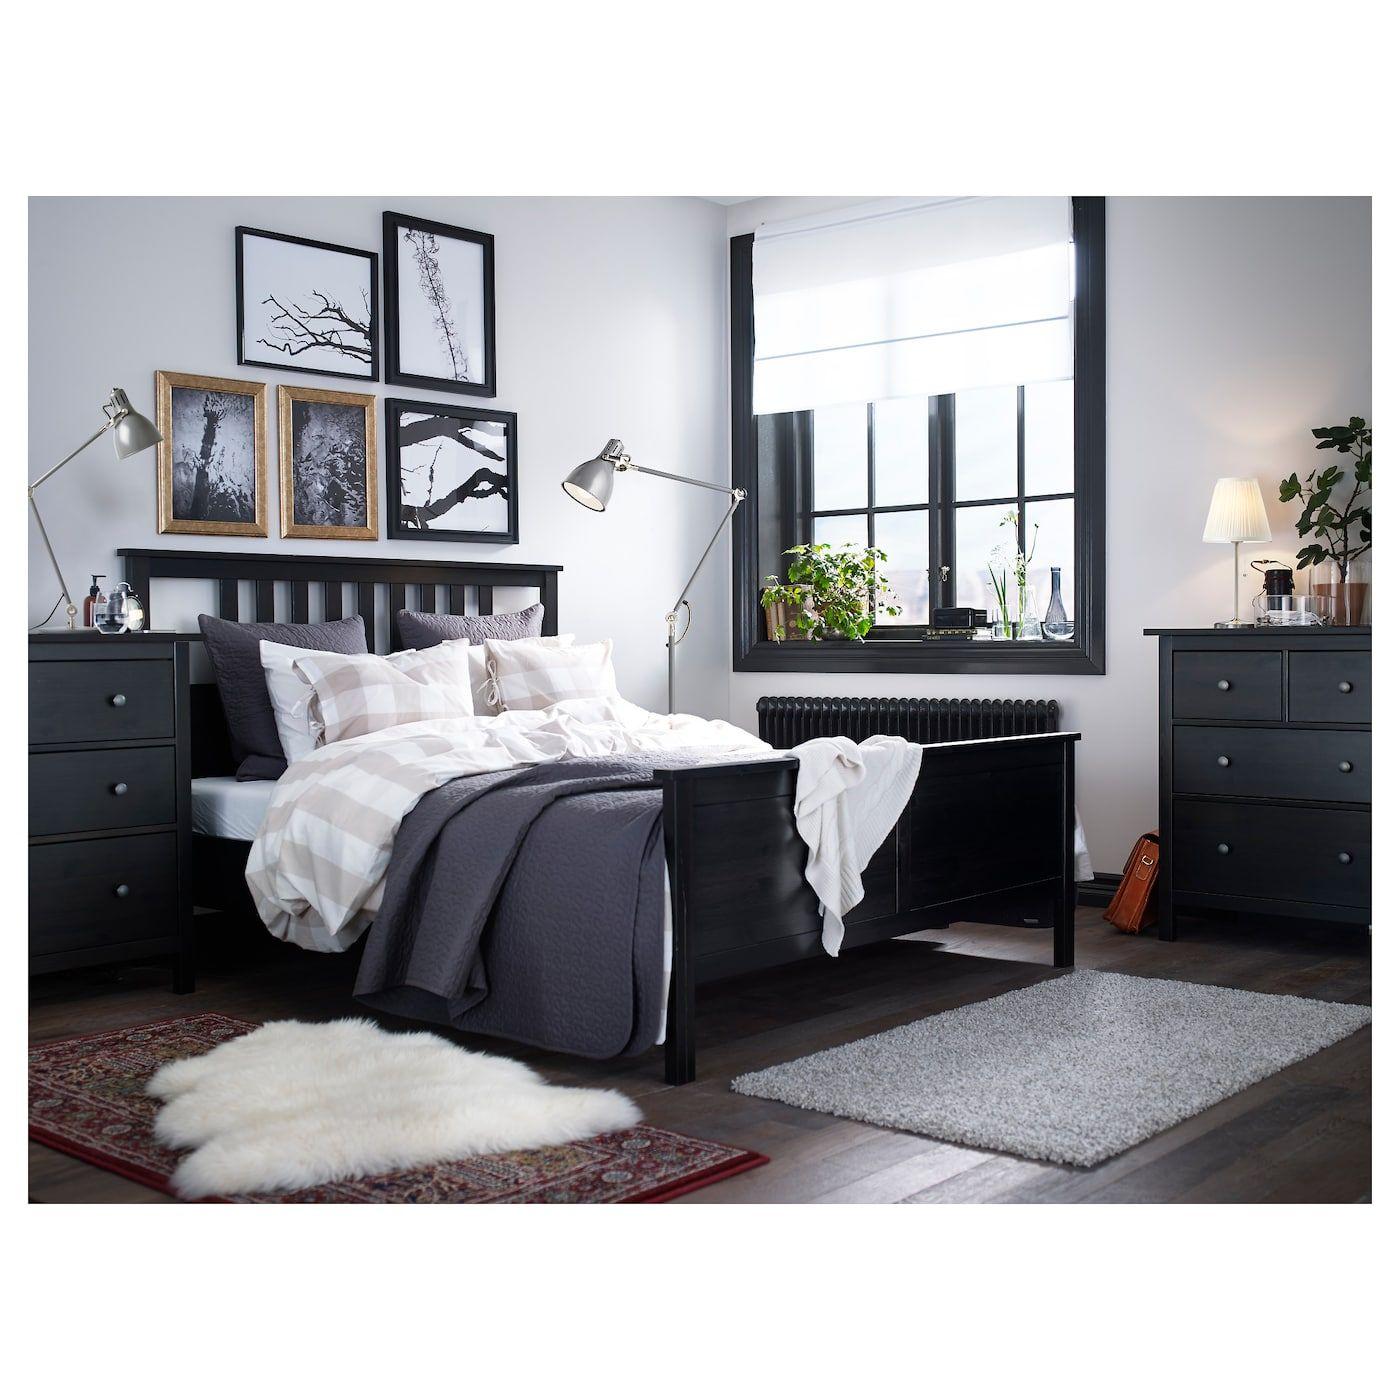 Ikea Us Furniture And Home Furnishings Black Bed Frame Ikea Hemnes Bed Ikea Bed Frames